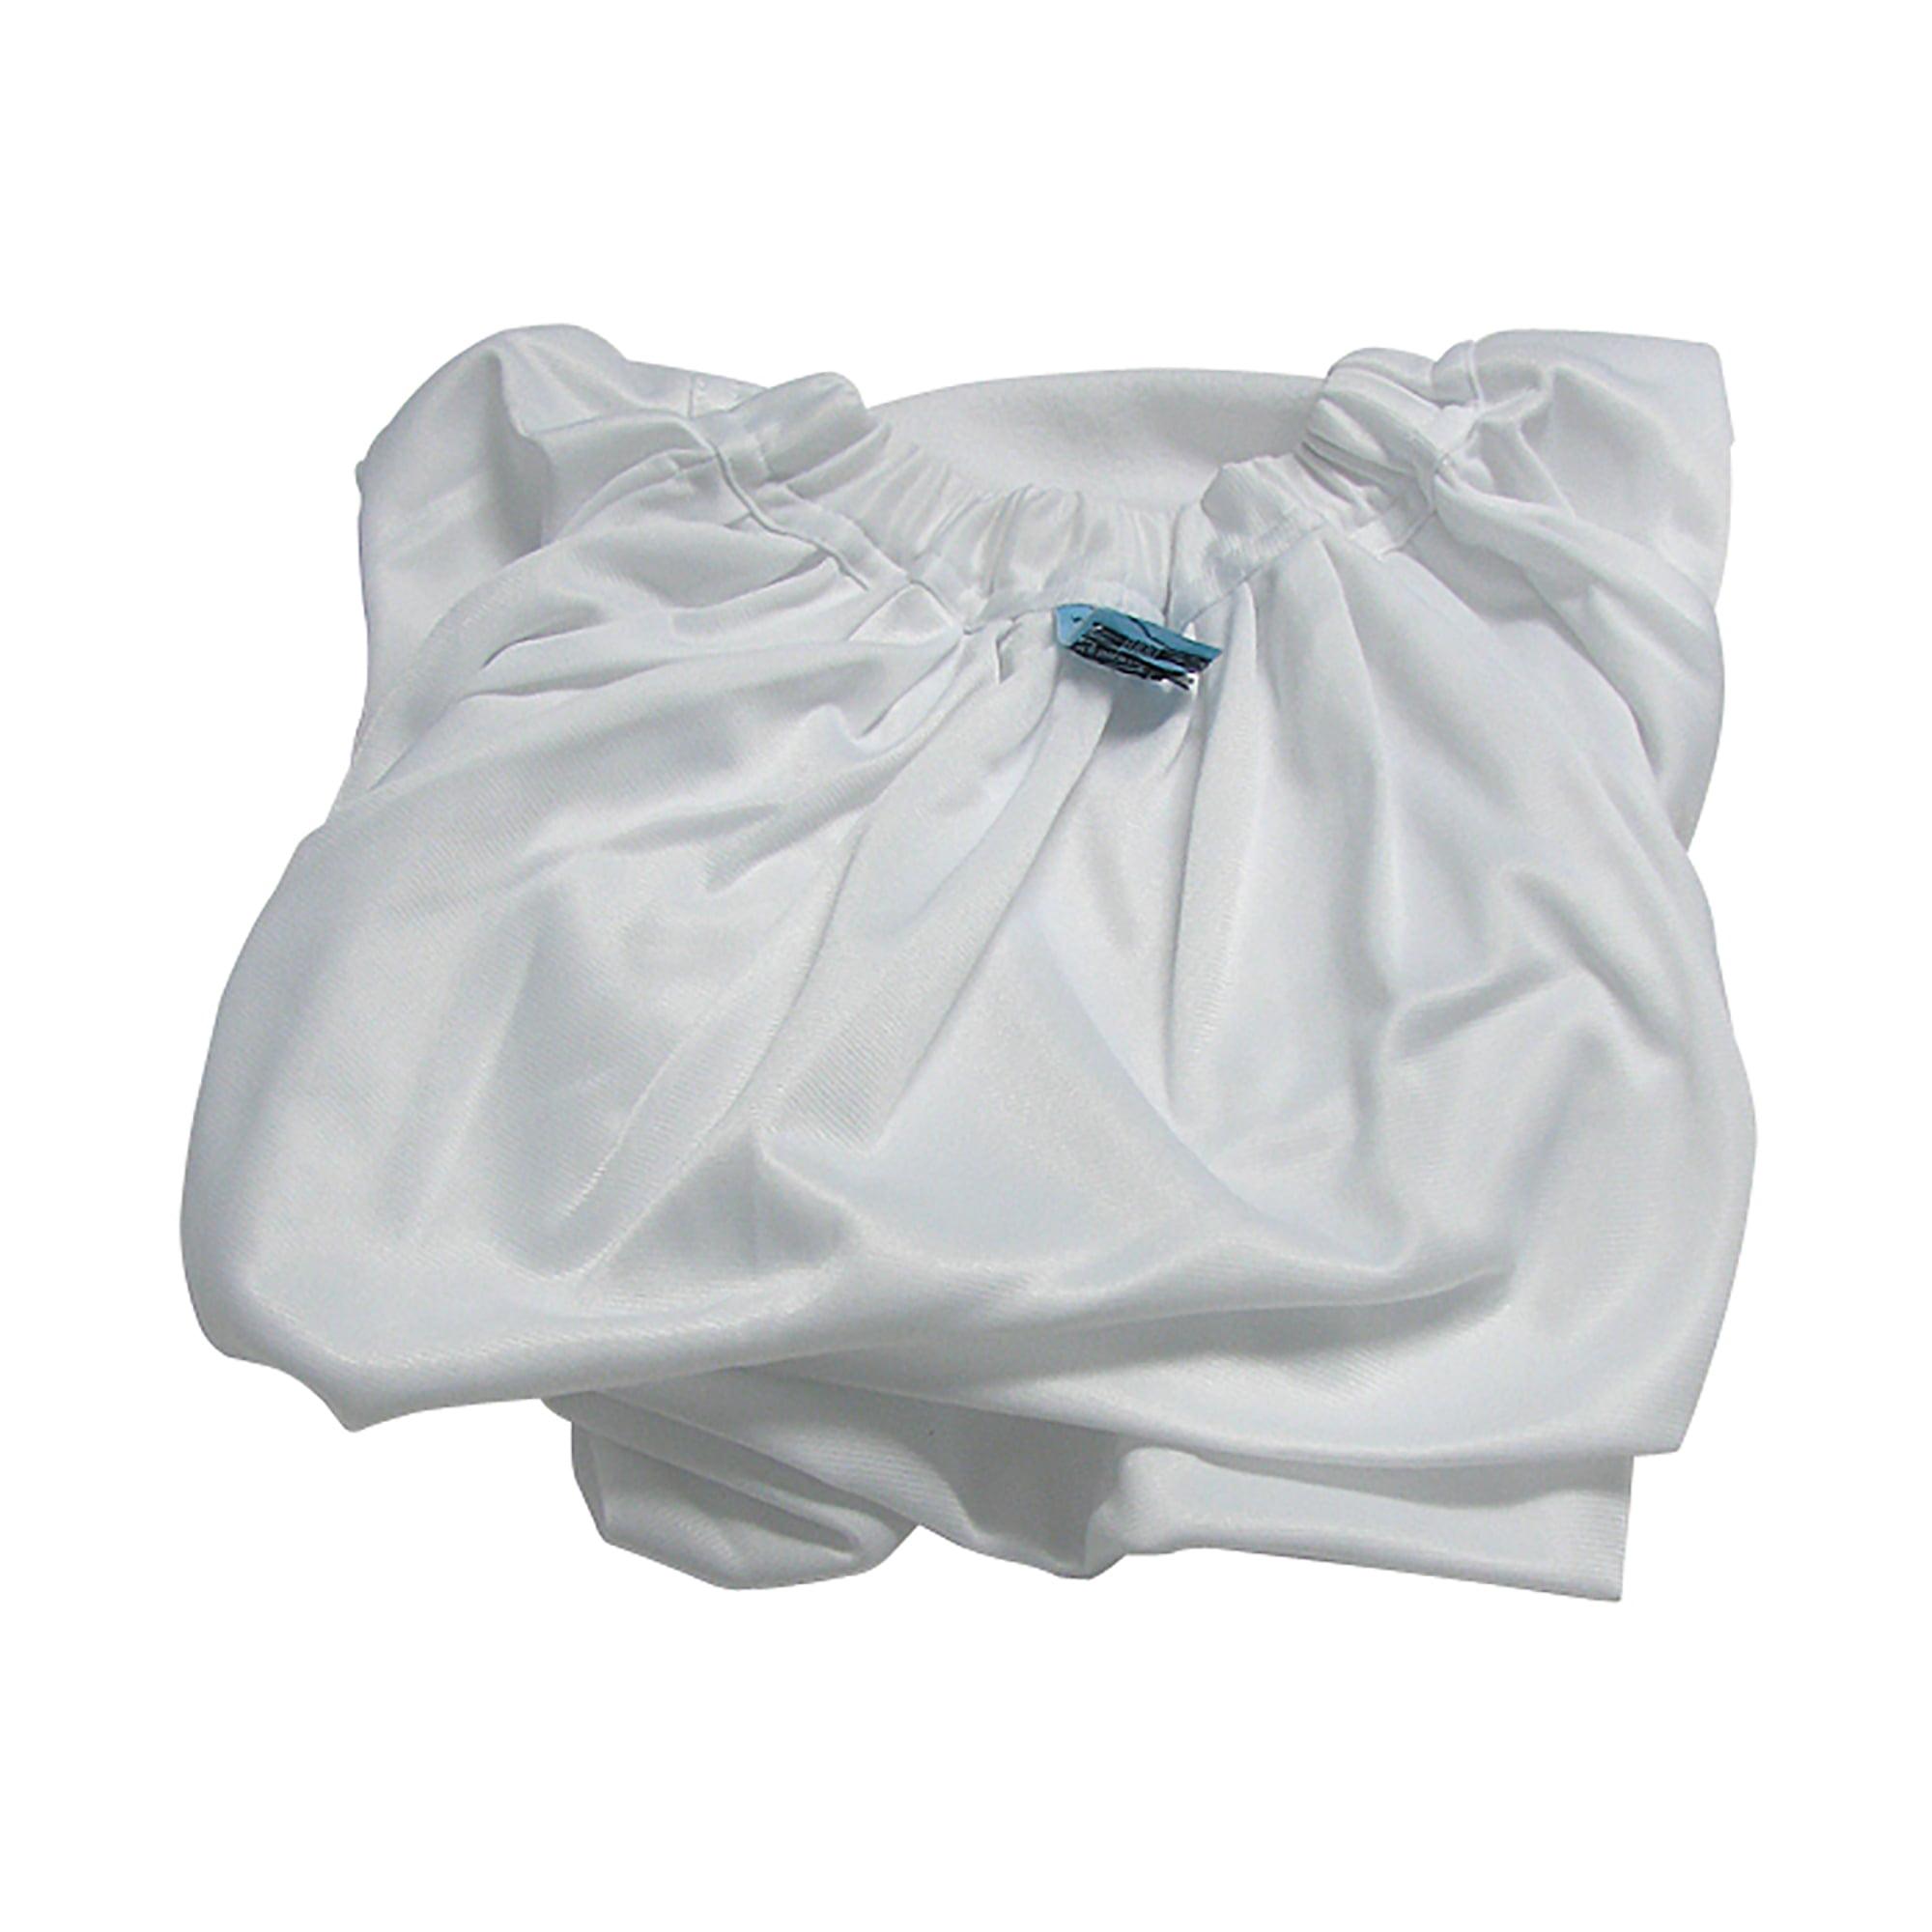 Blue Wave Aquafirst & Aquabot Economy Pool Cleaner Replacement Filter Bag